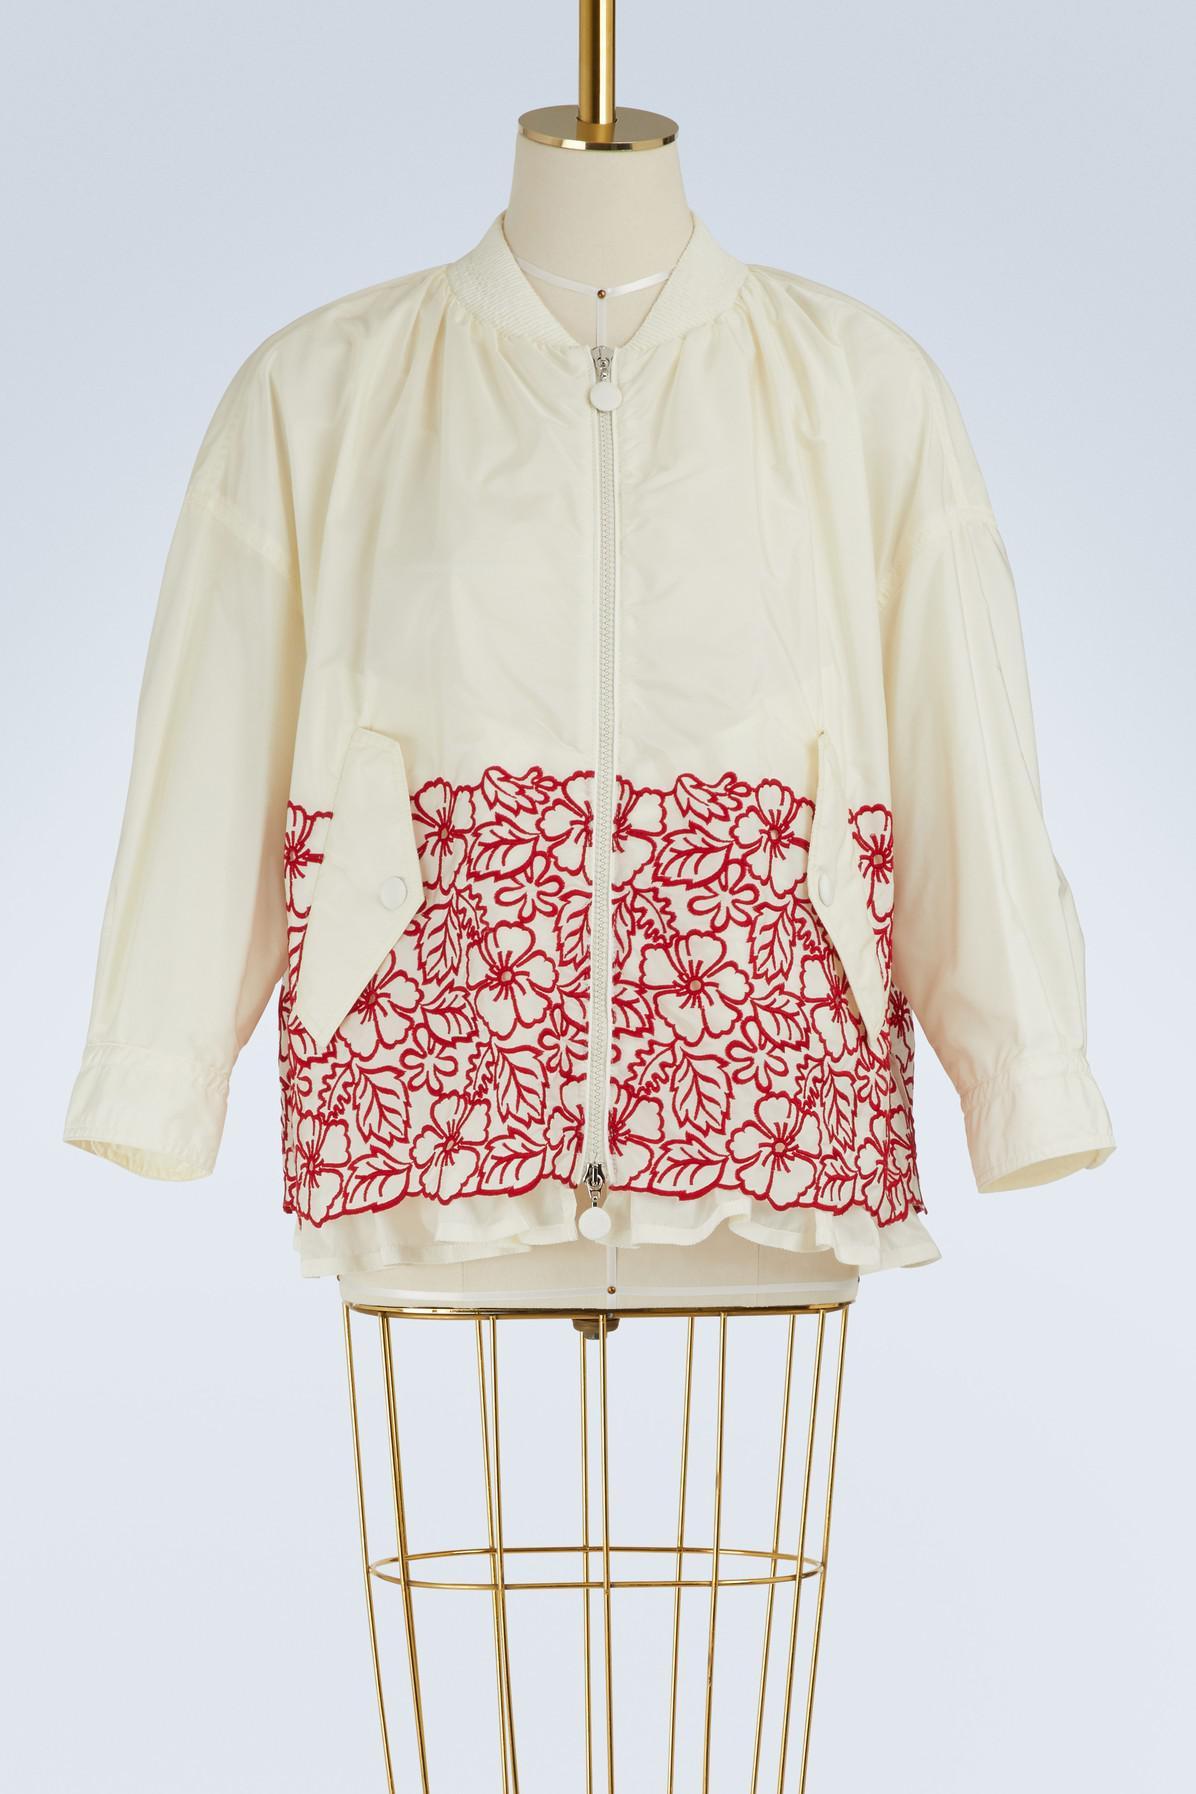 Moncler. Women's White Irish Embroidered Bomber Jacket